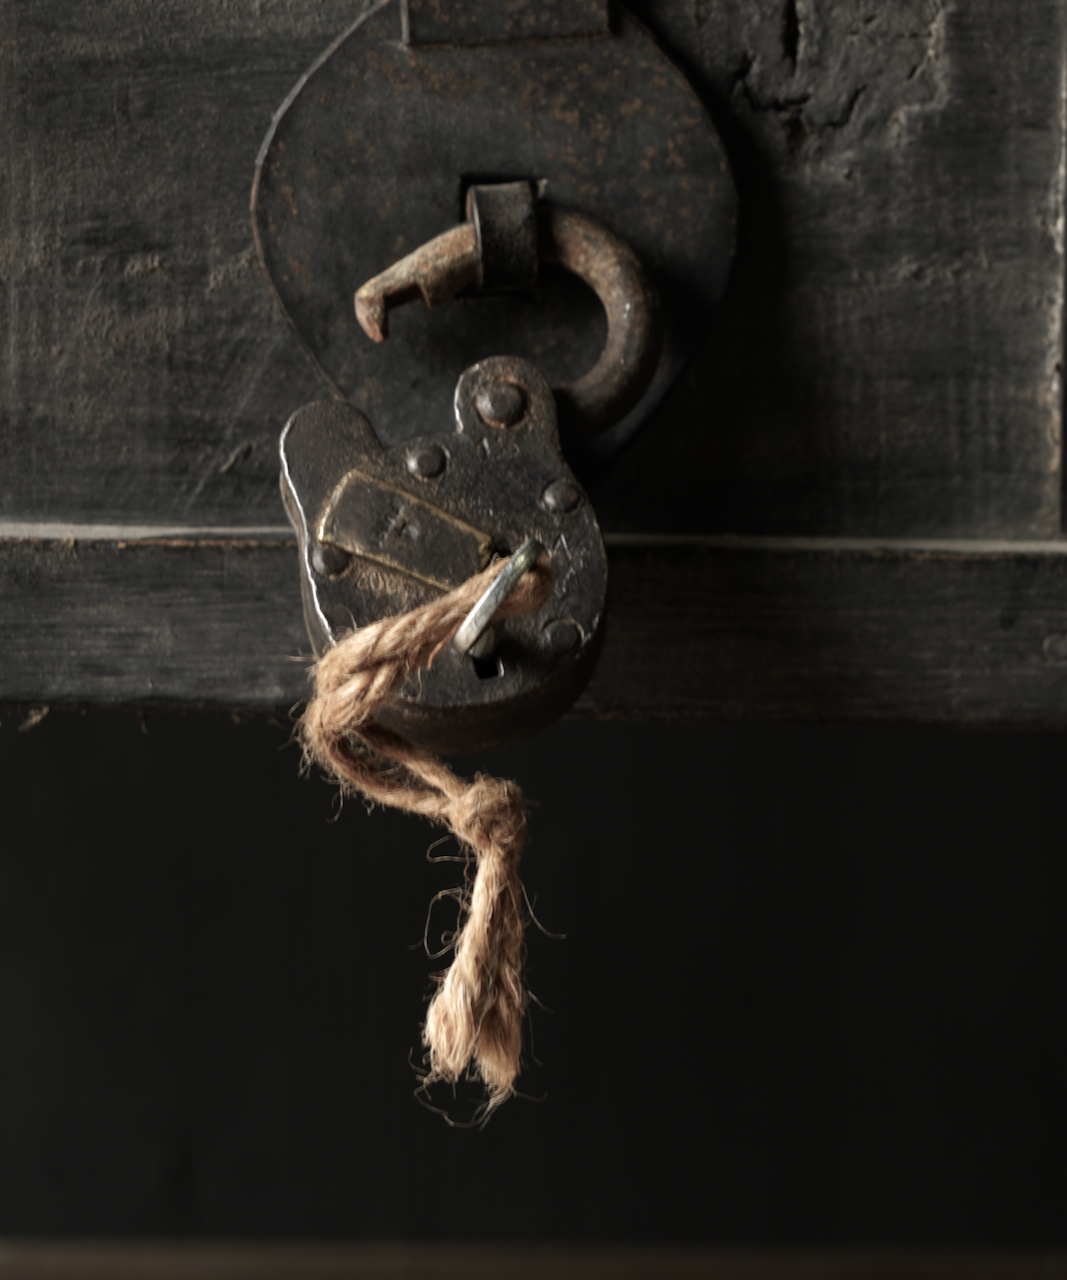 Oude gerestaureerde hangslot met sleutel-2